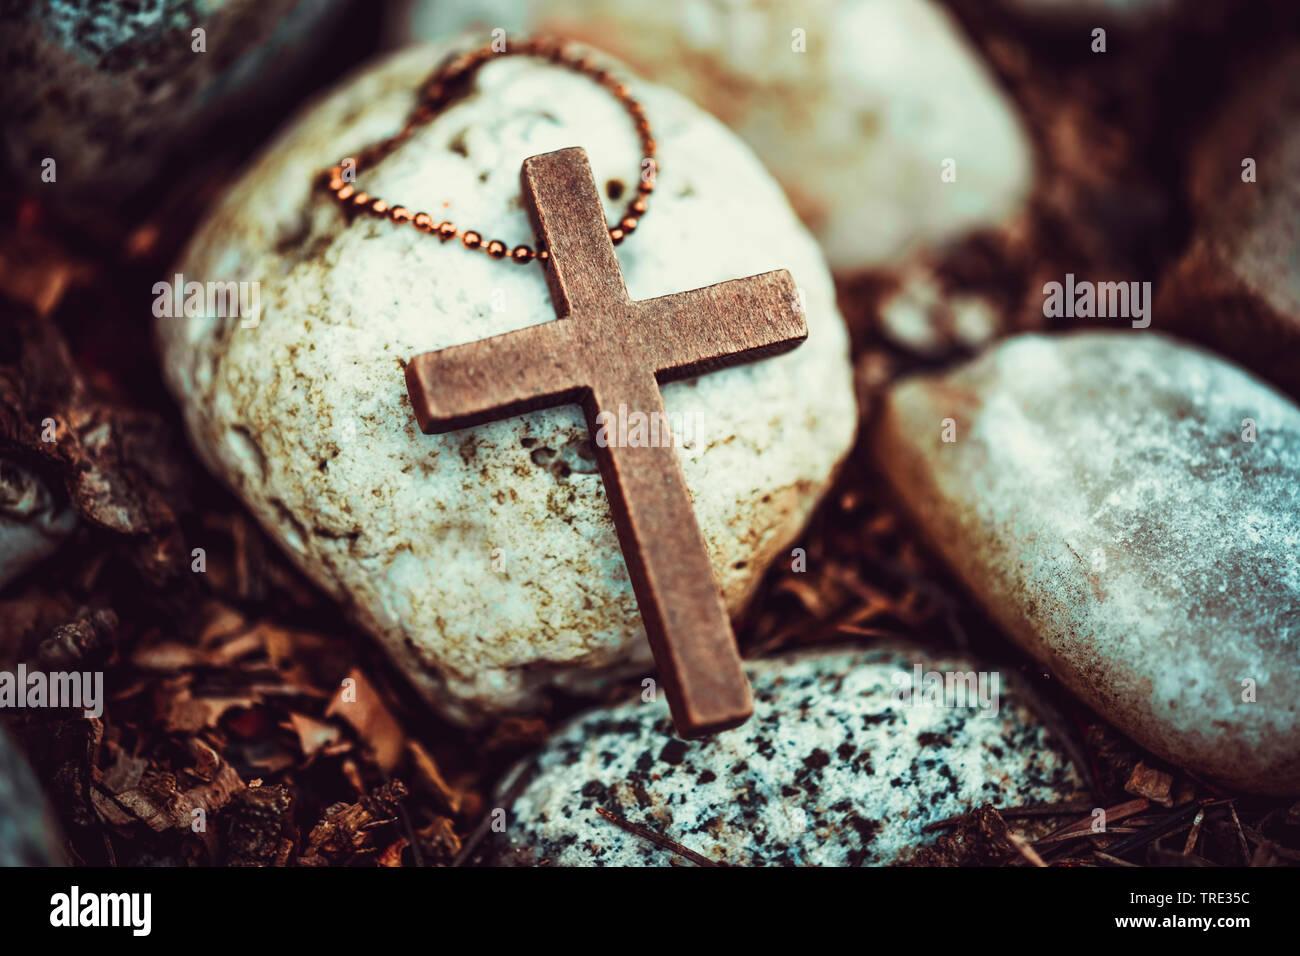 Kreuz liegt auf Kies, Deutschland | cross lying on pebbles, Germany | BLWS515948.jpg [ (c) blickwinkel/McPHOTO/C. Ohde Tel. +49 (0)2302-2793220, E-mai - Stock Image